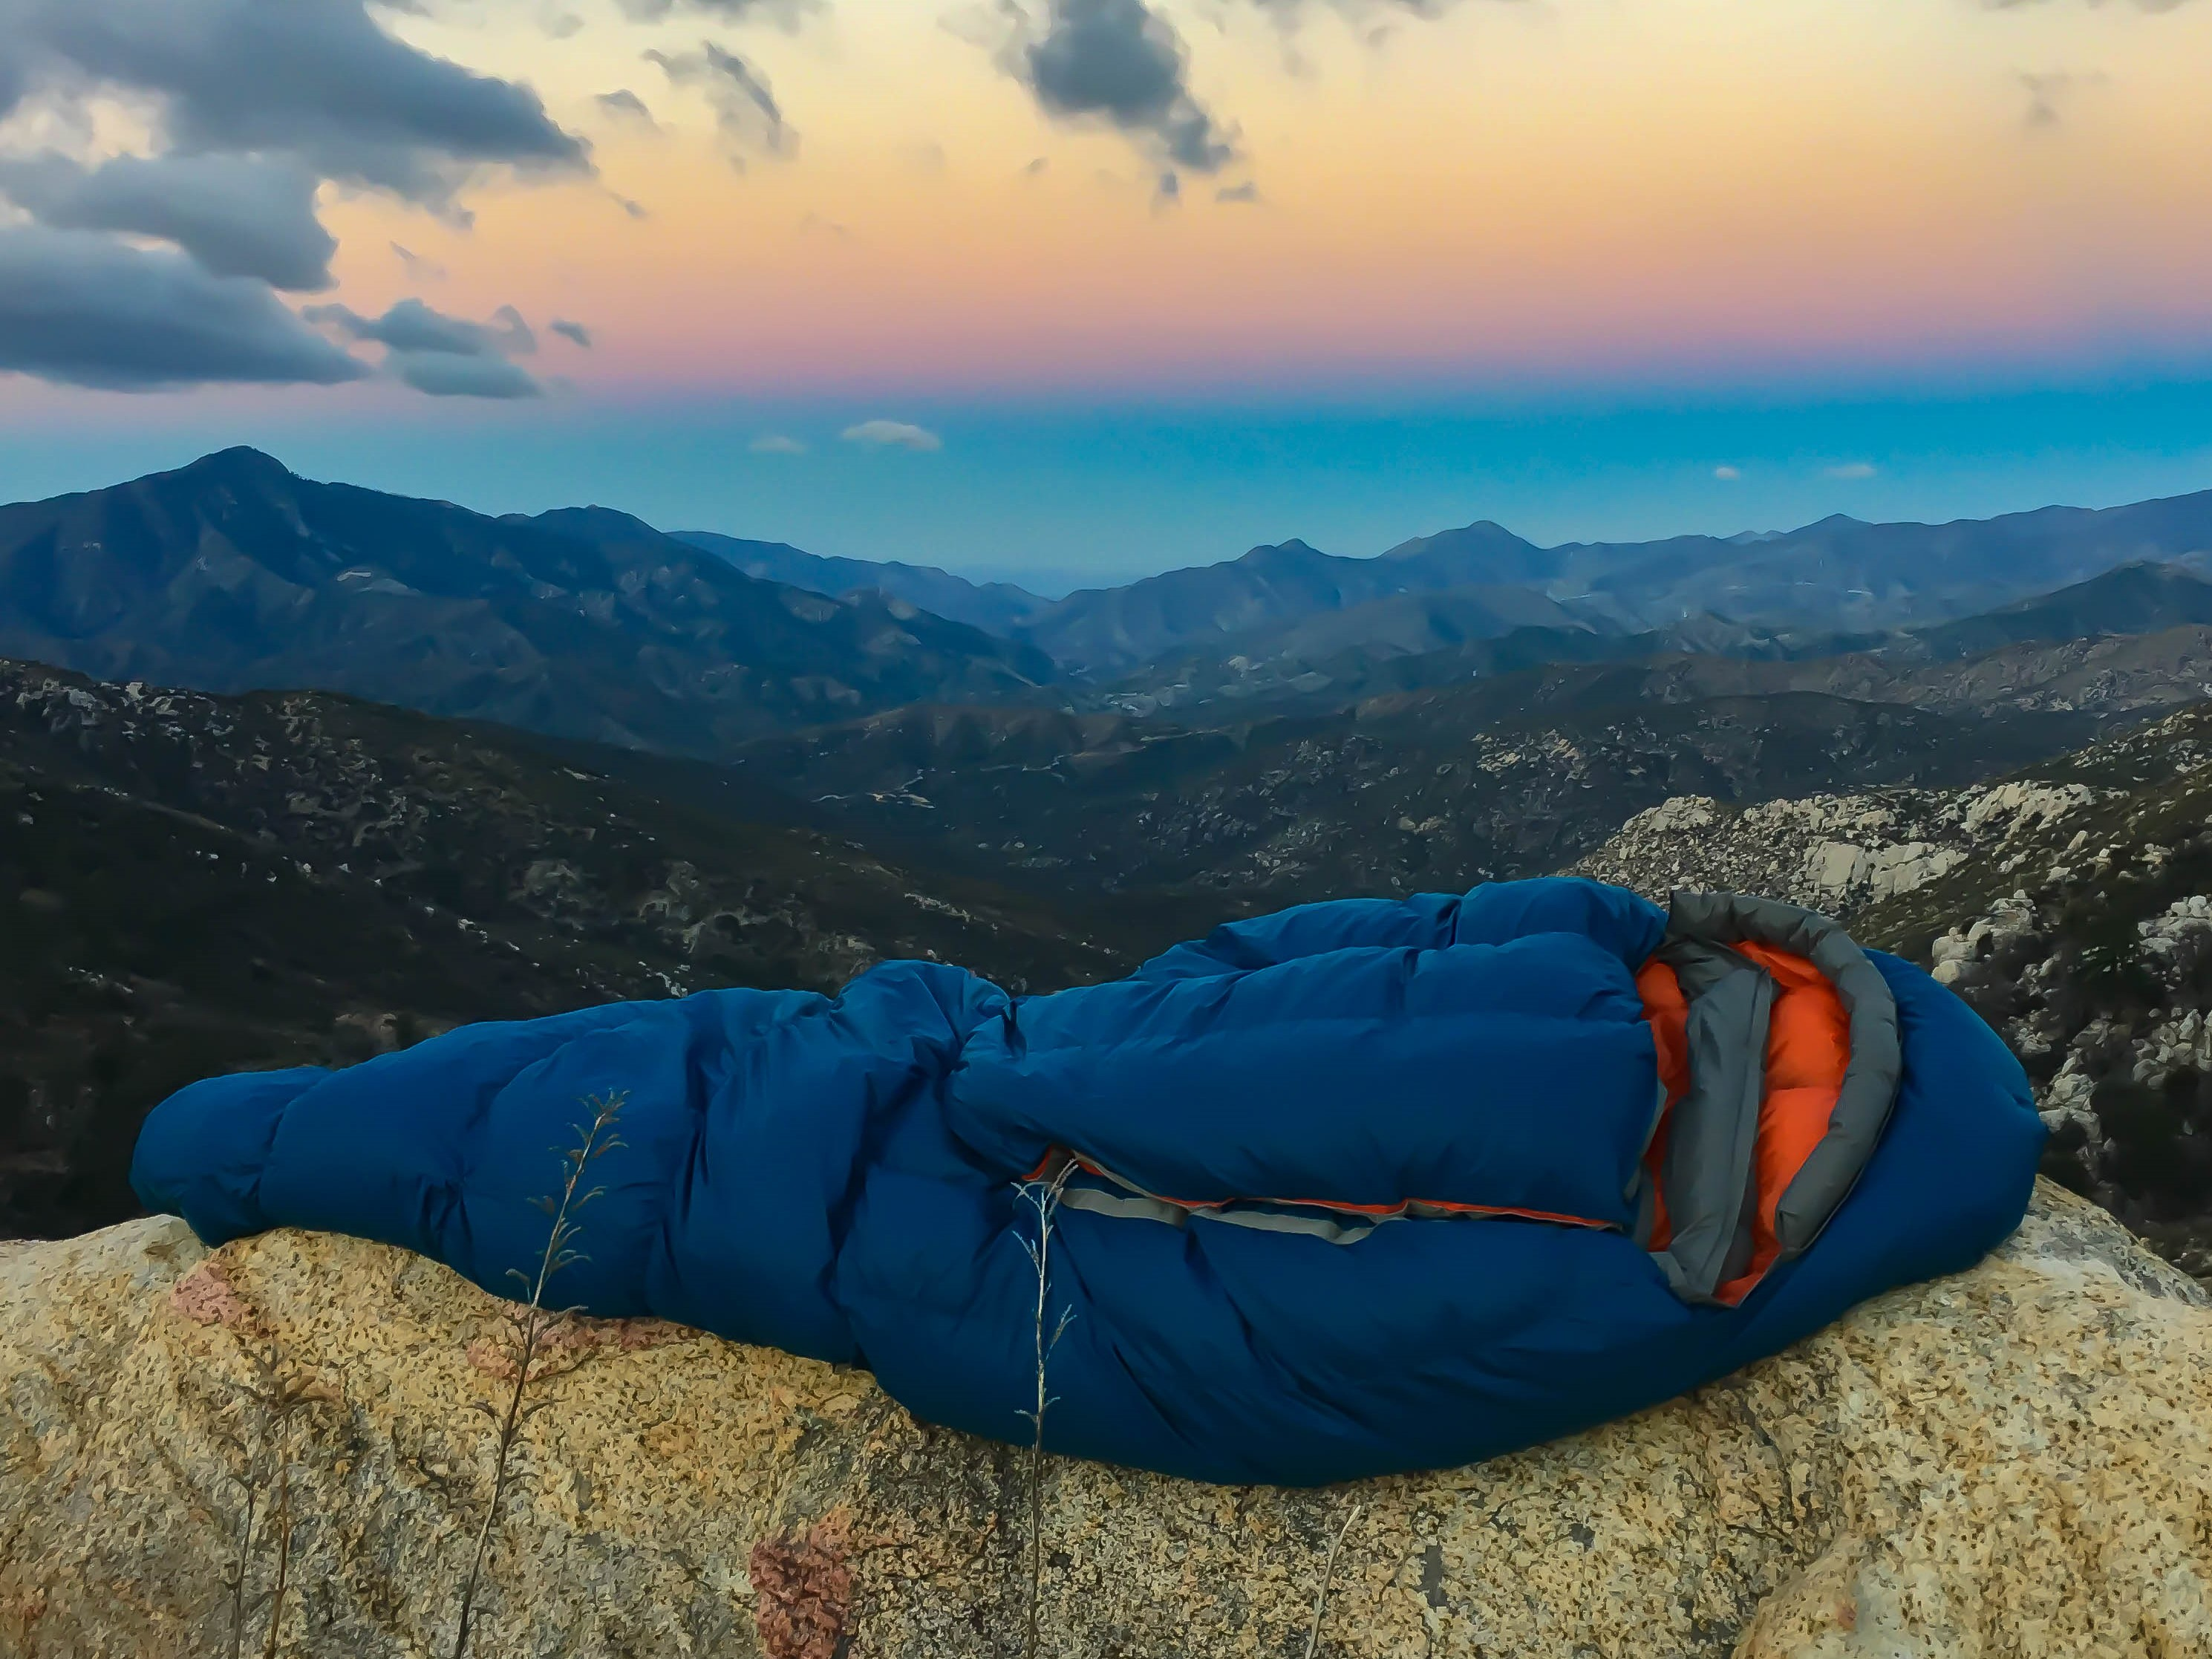 Building Better Sleeping Bags Outdoor Gear Startup Nozipp